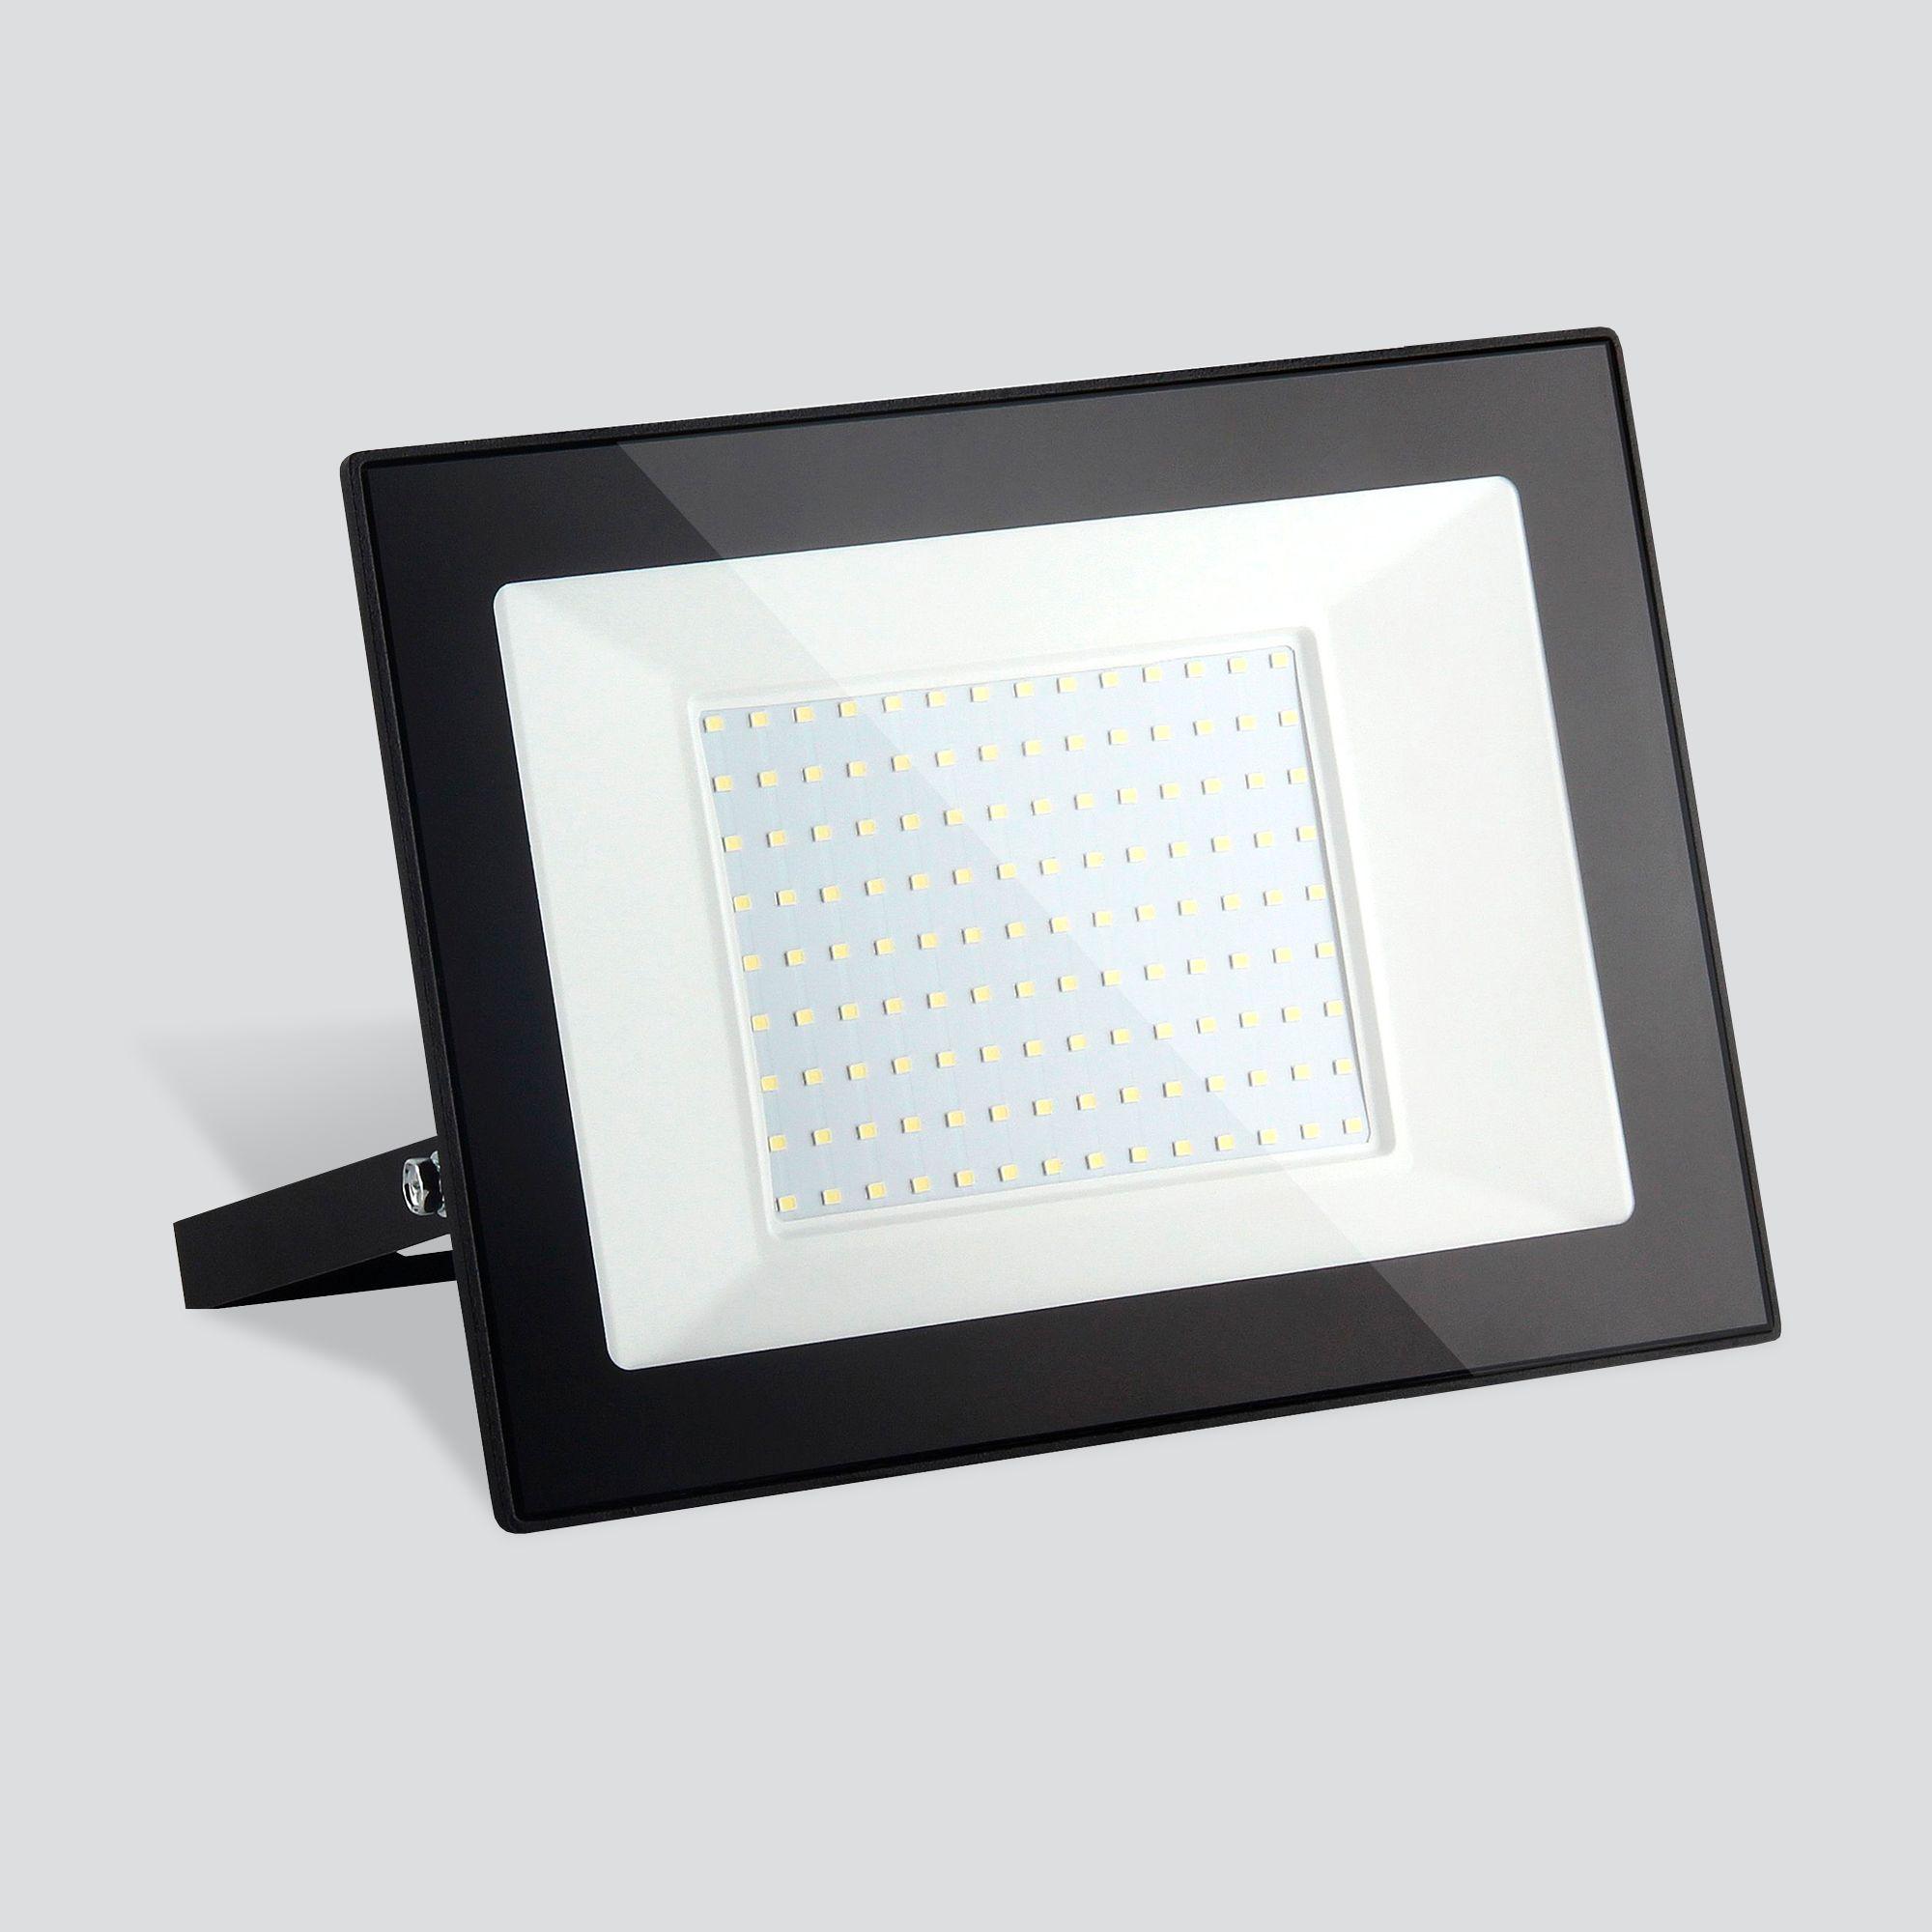 Прожектор Elementary 033 FL LED 150W 4200K IP65 033 FL LED 150W 4200K IP65